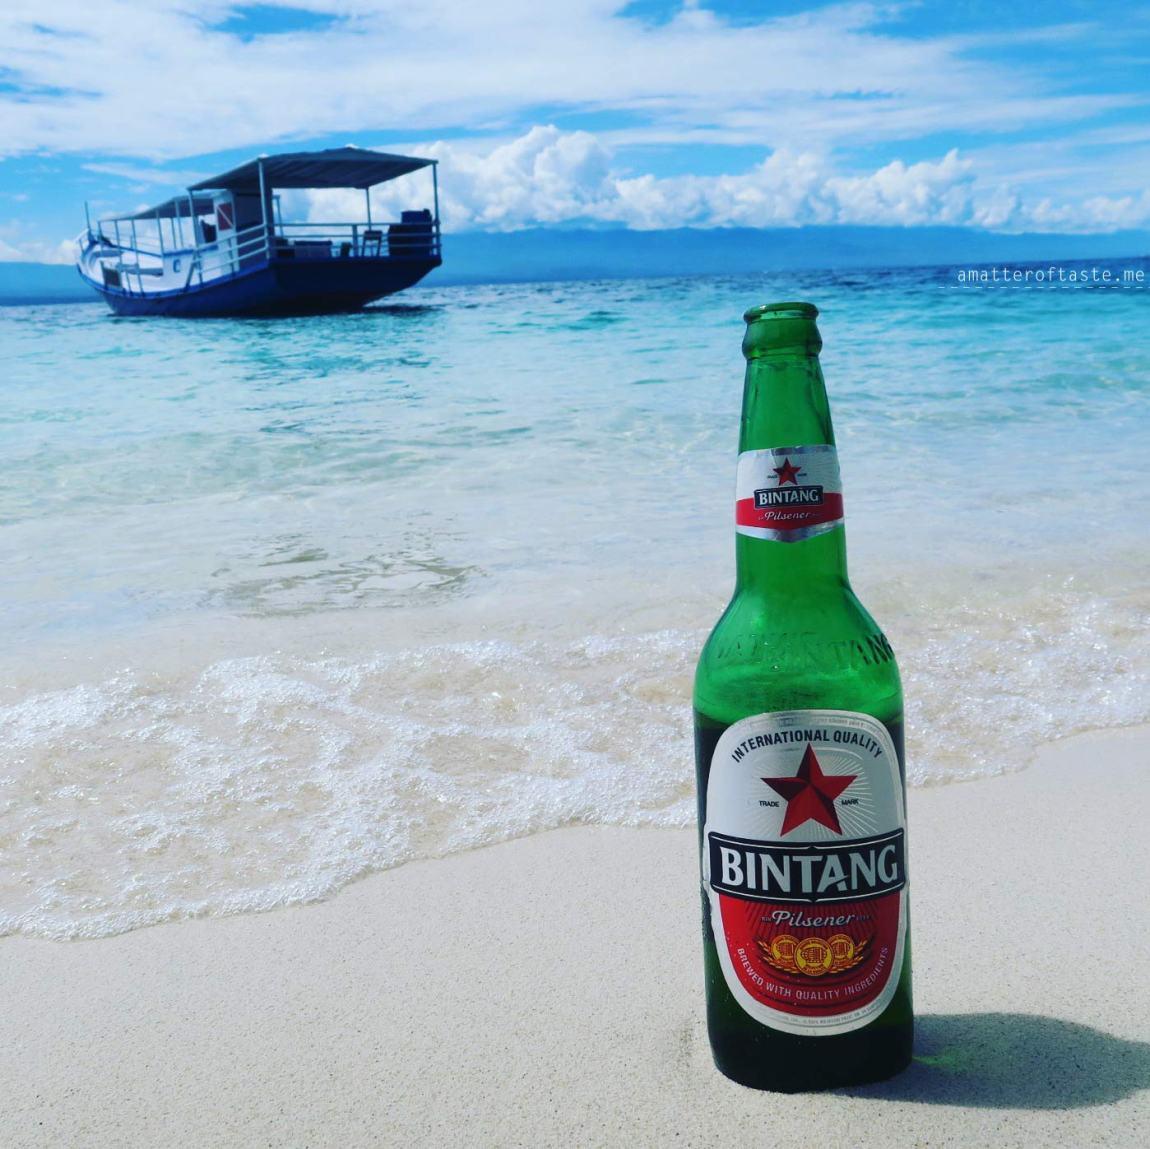 6-relax-beach-palu-bintang